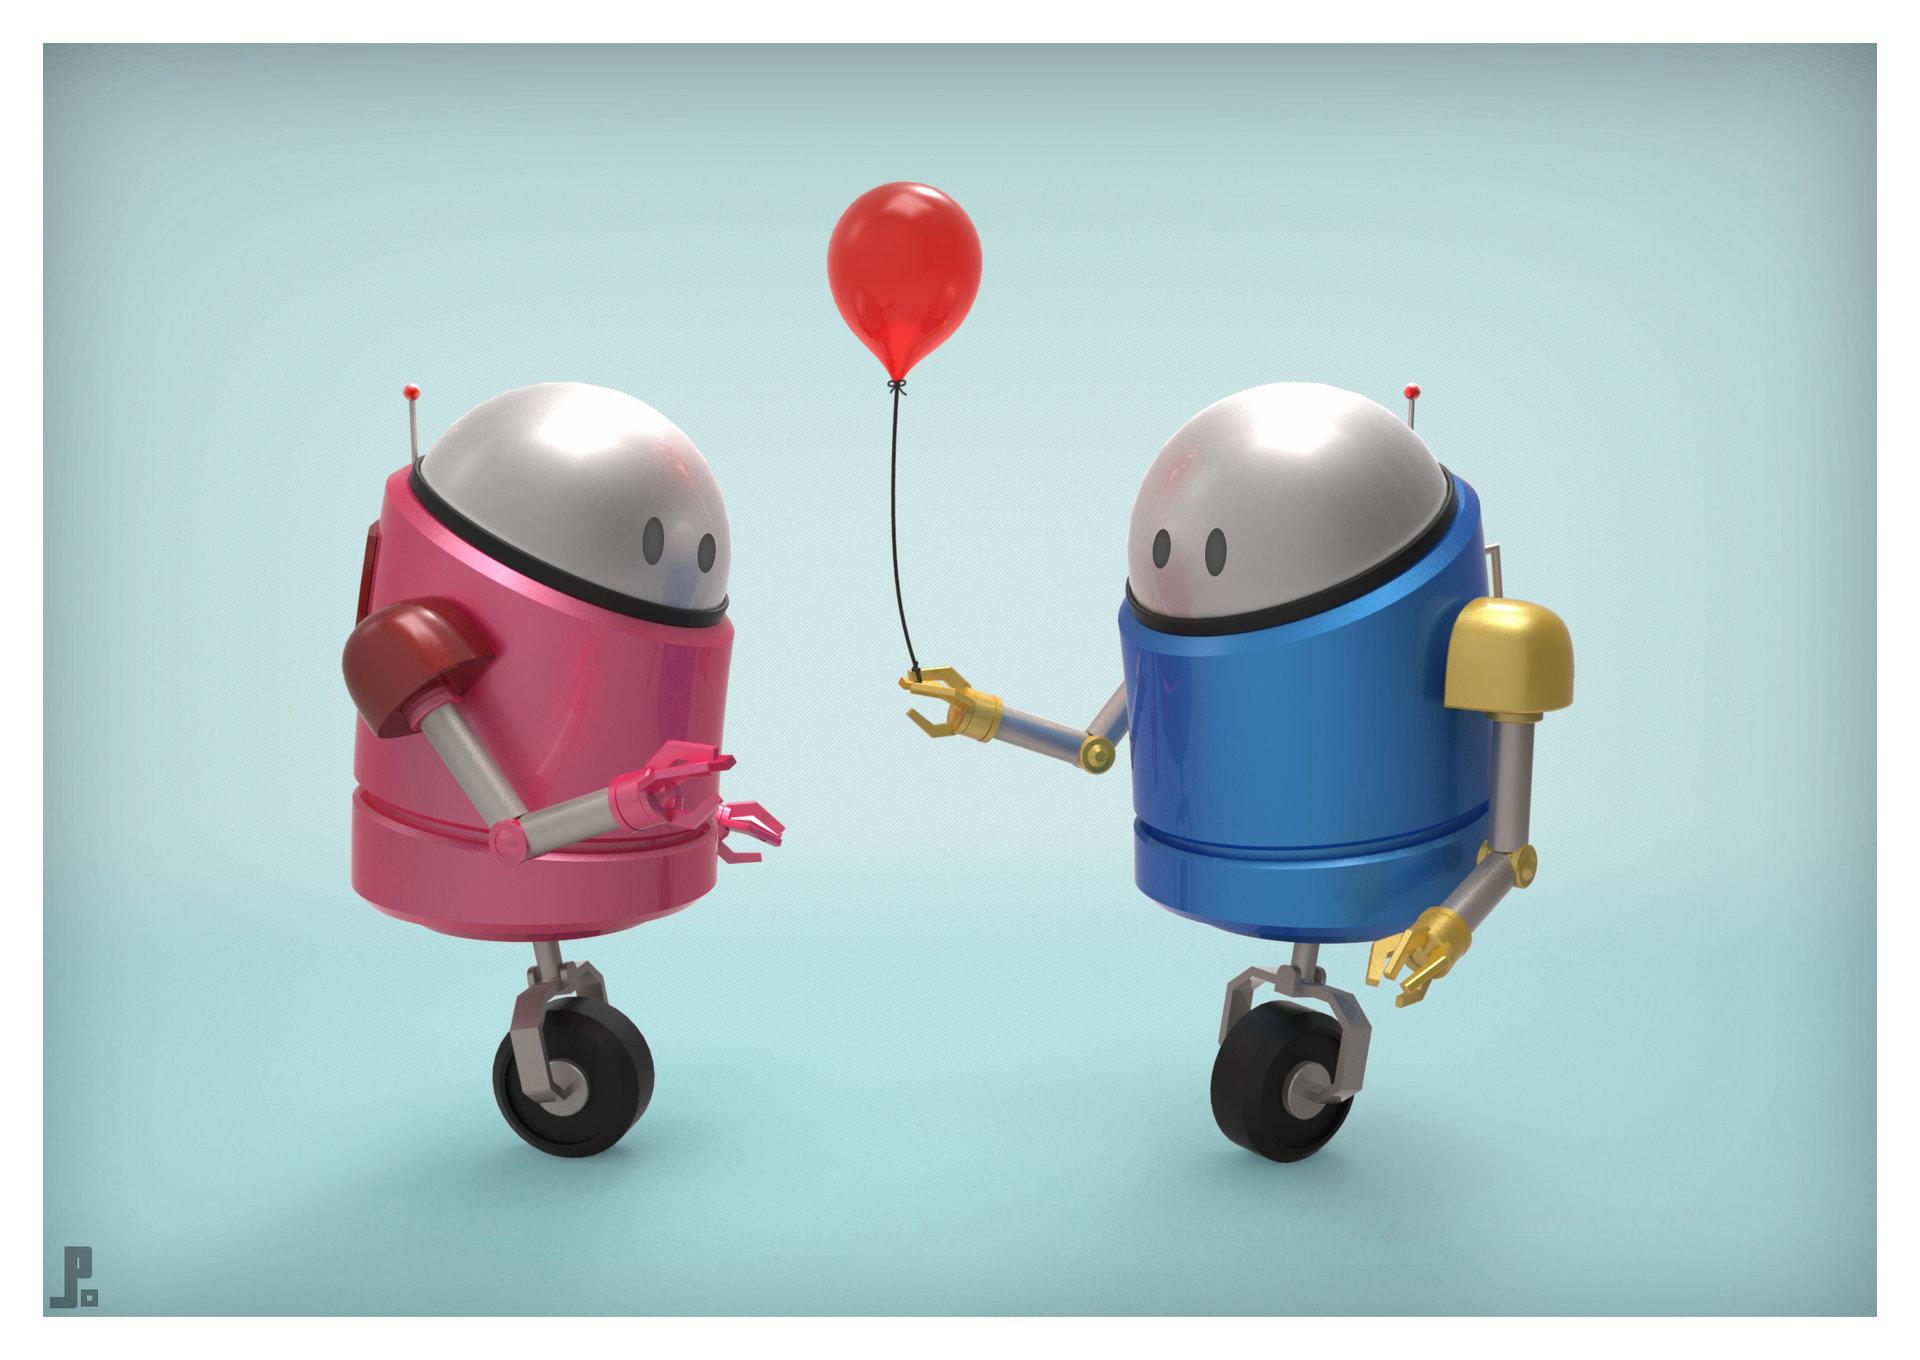 Jarlan perez minibots balloons2